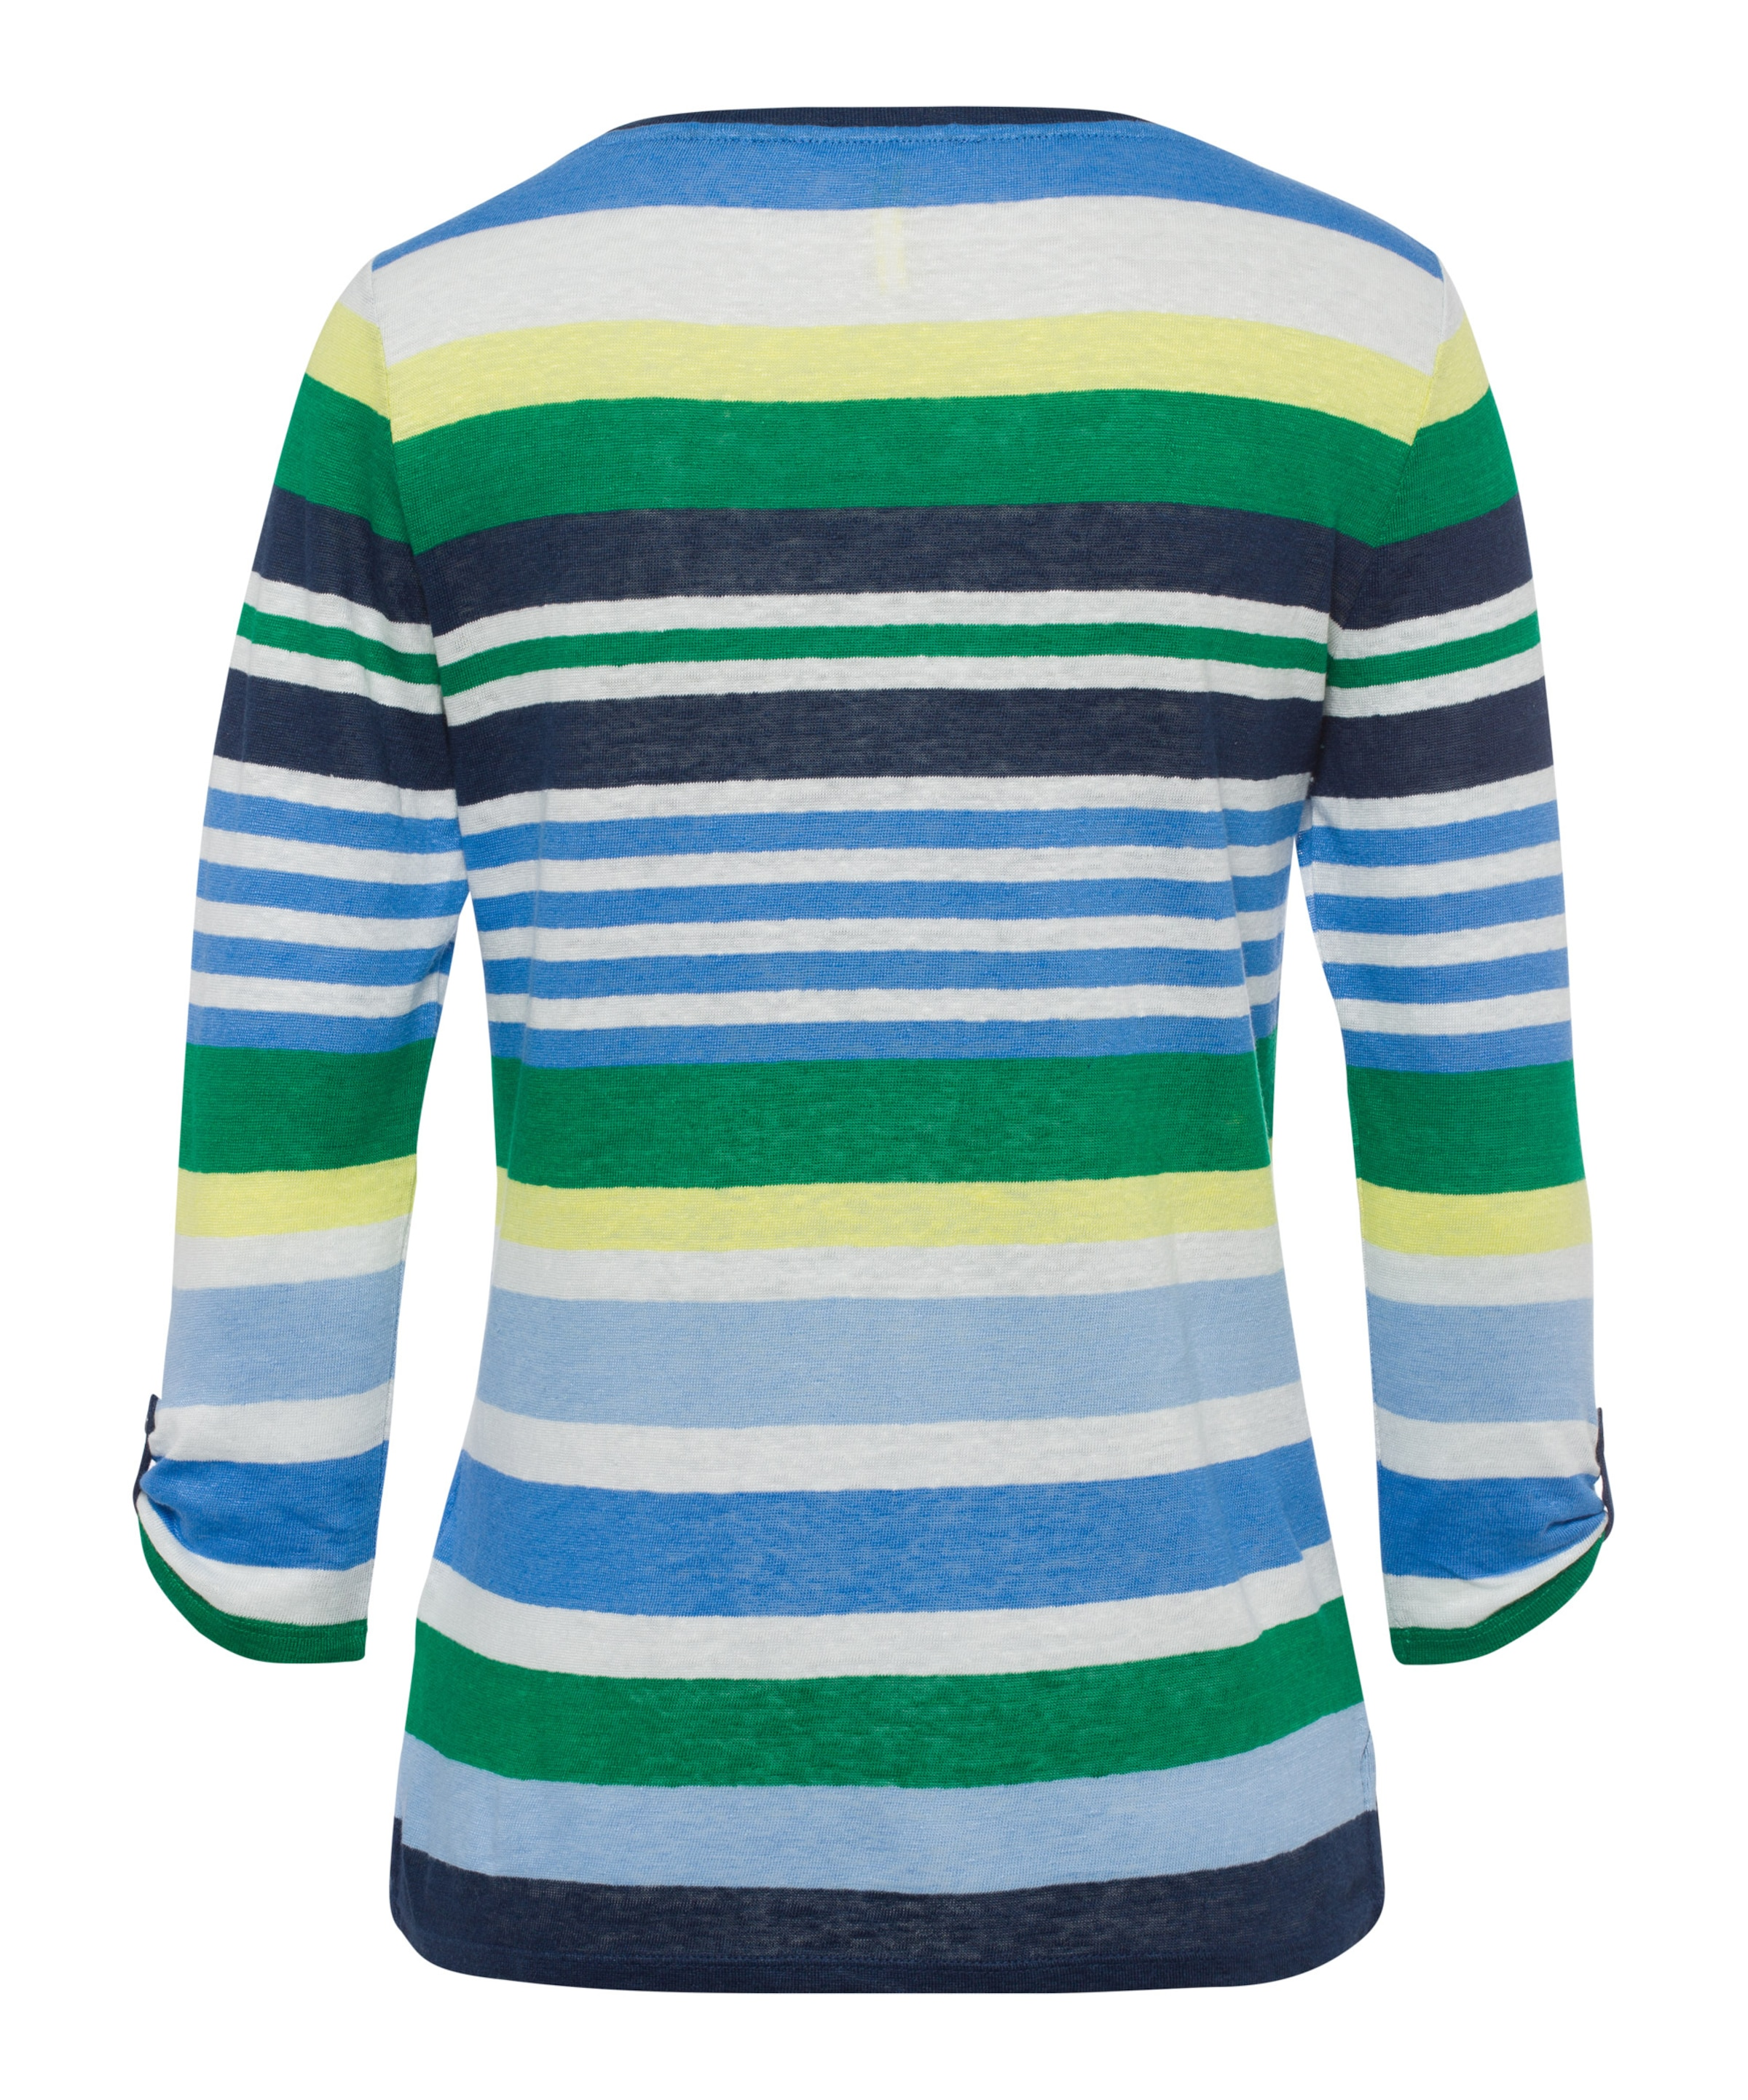 In Shirt Weiß Grün 'carol' Brax BlauGelb CedBxo